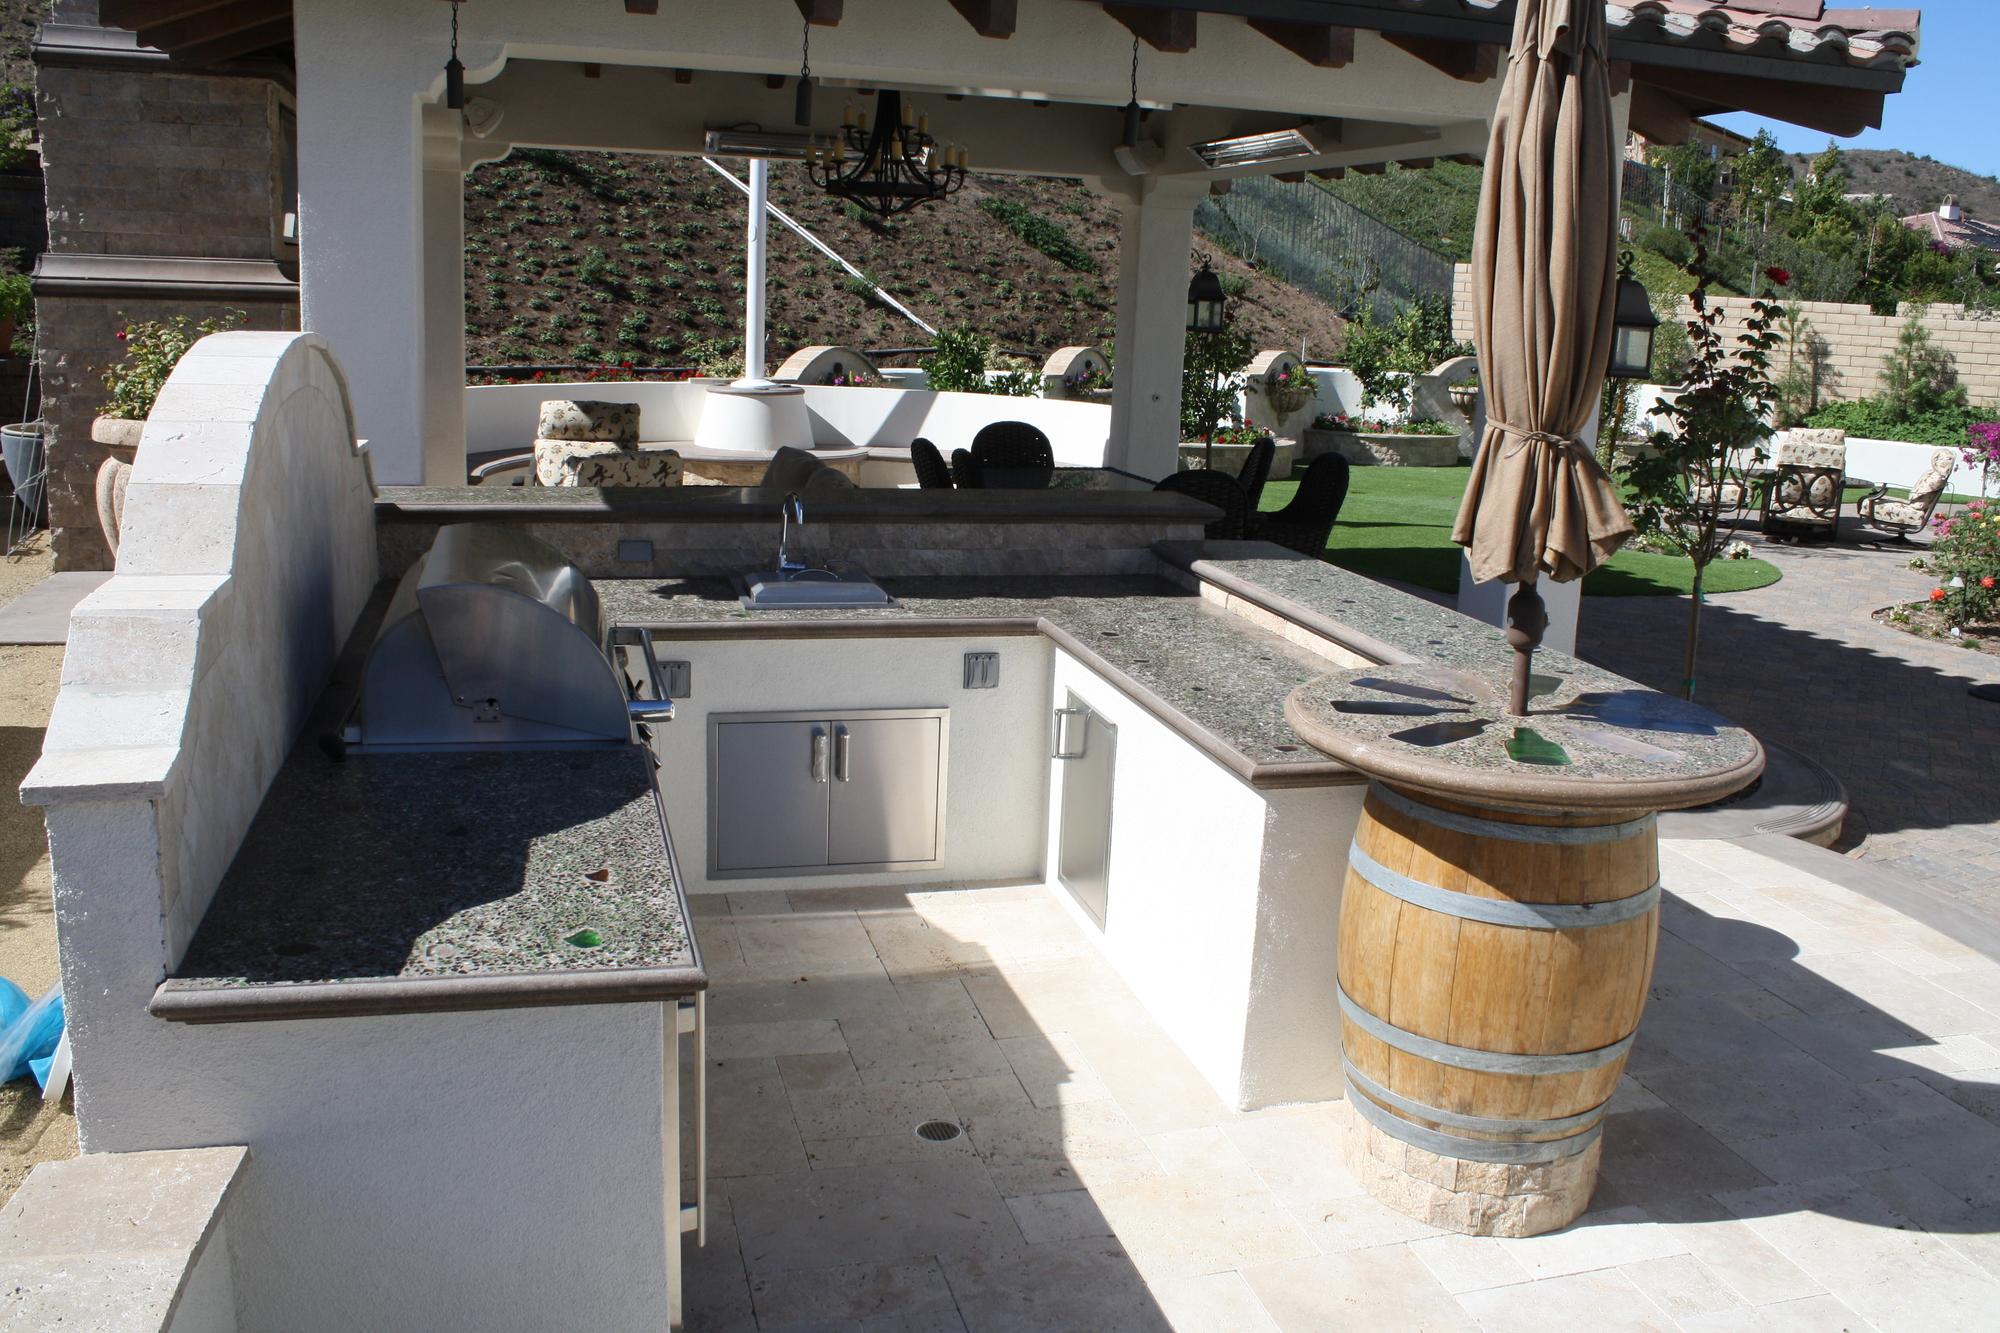 Wine Bottle Barbecue Concrete Construction Magazine